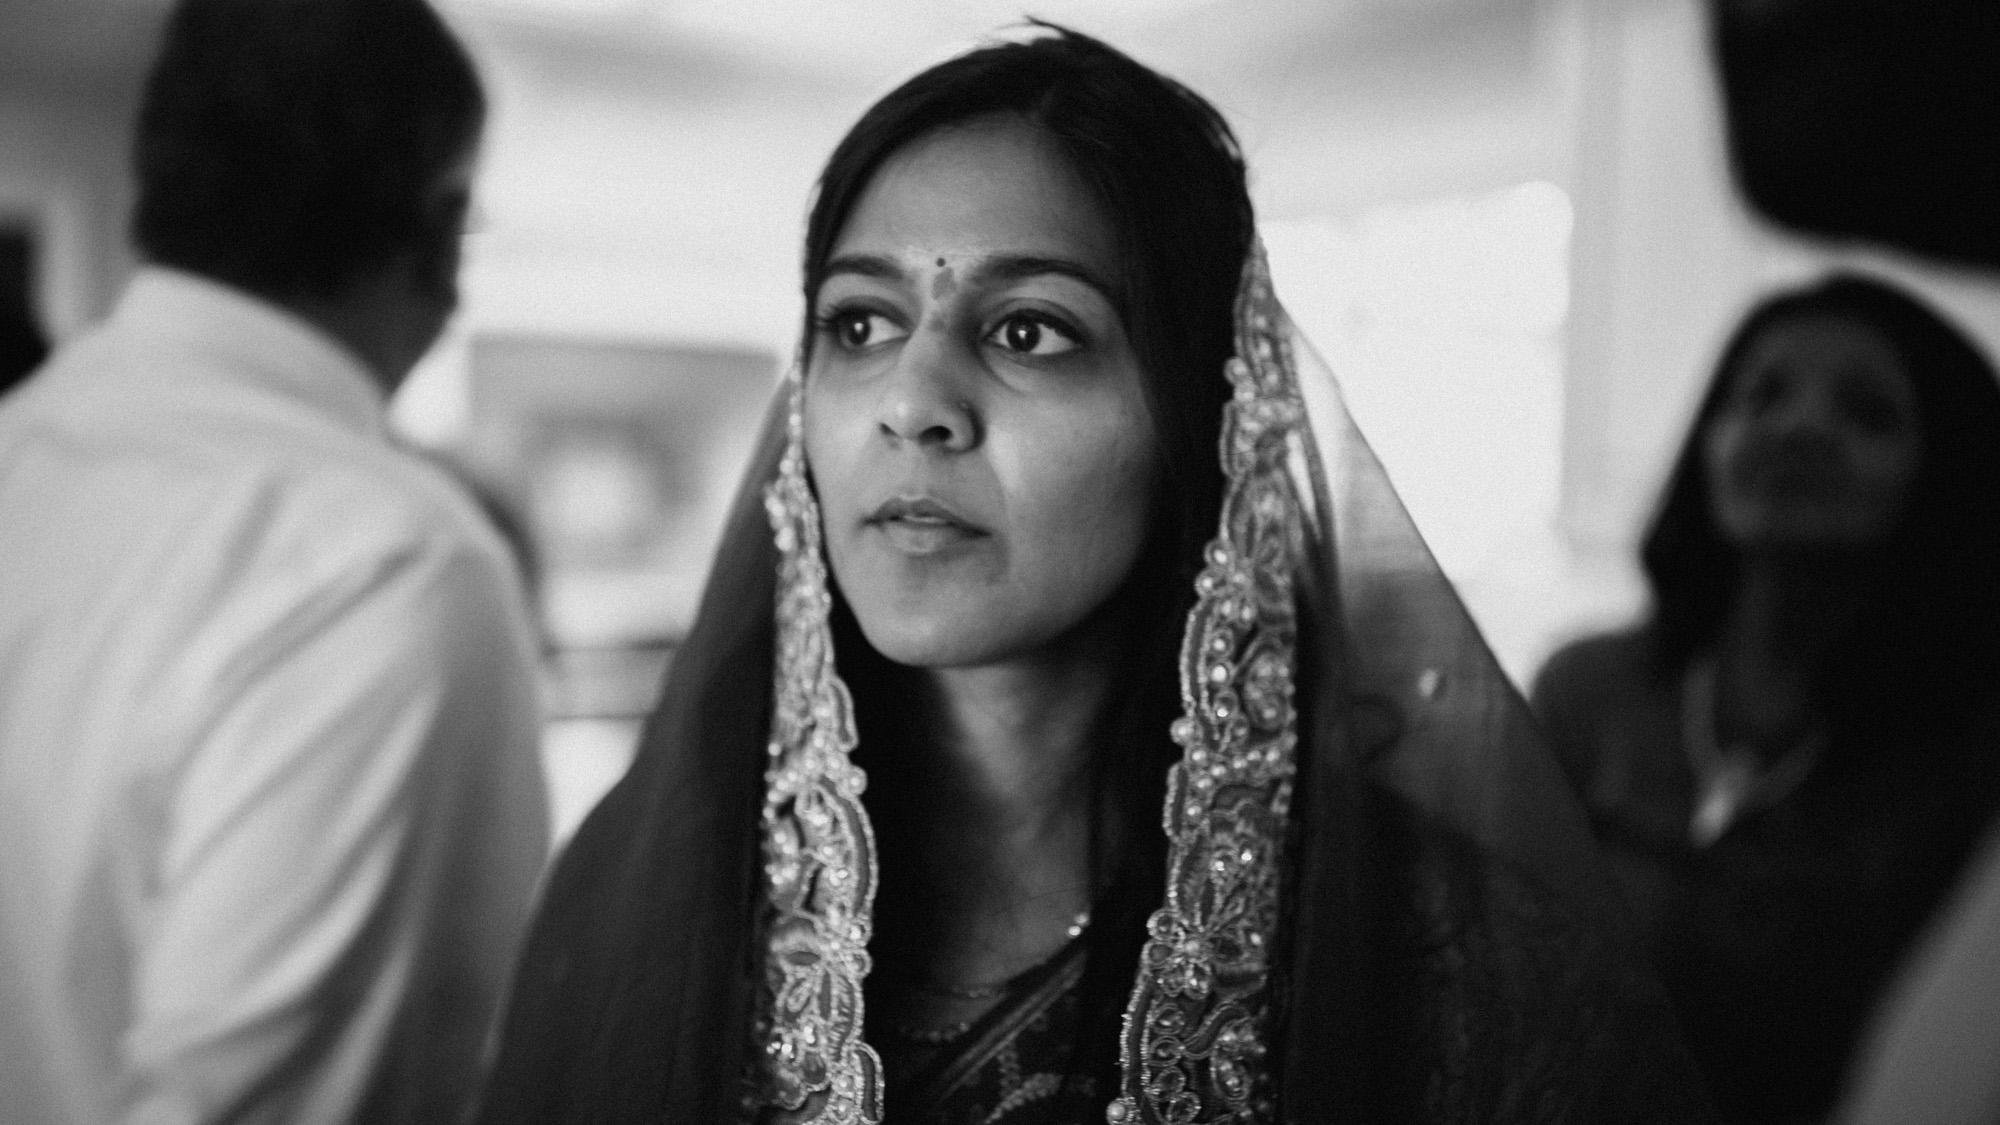 anu_maneesh_alec_vanderboom_Indian_wedding_photography-0196.jpg